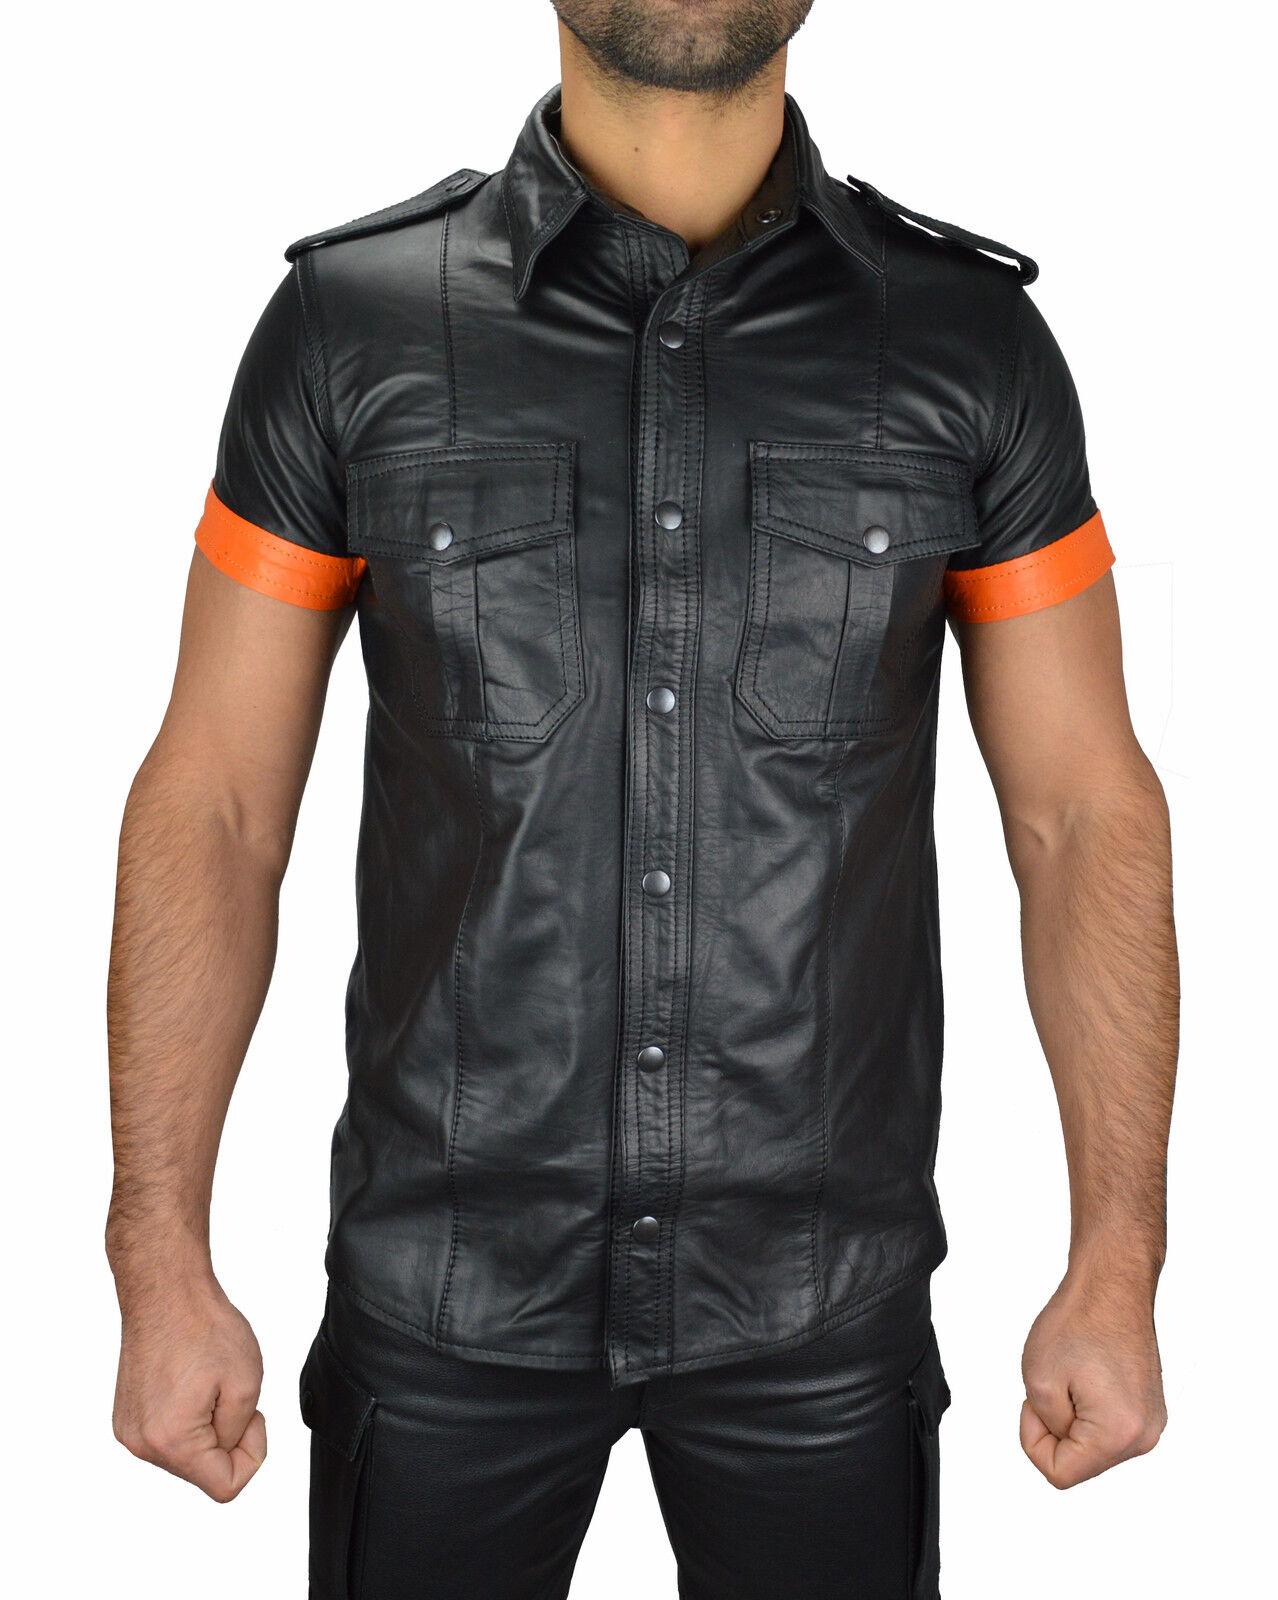 Awanstar Camicia in pelle pelle liscia con paragrafi, Leather Shirt, Camicia In Pelle, Gilet in Pelle